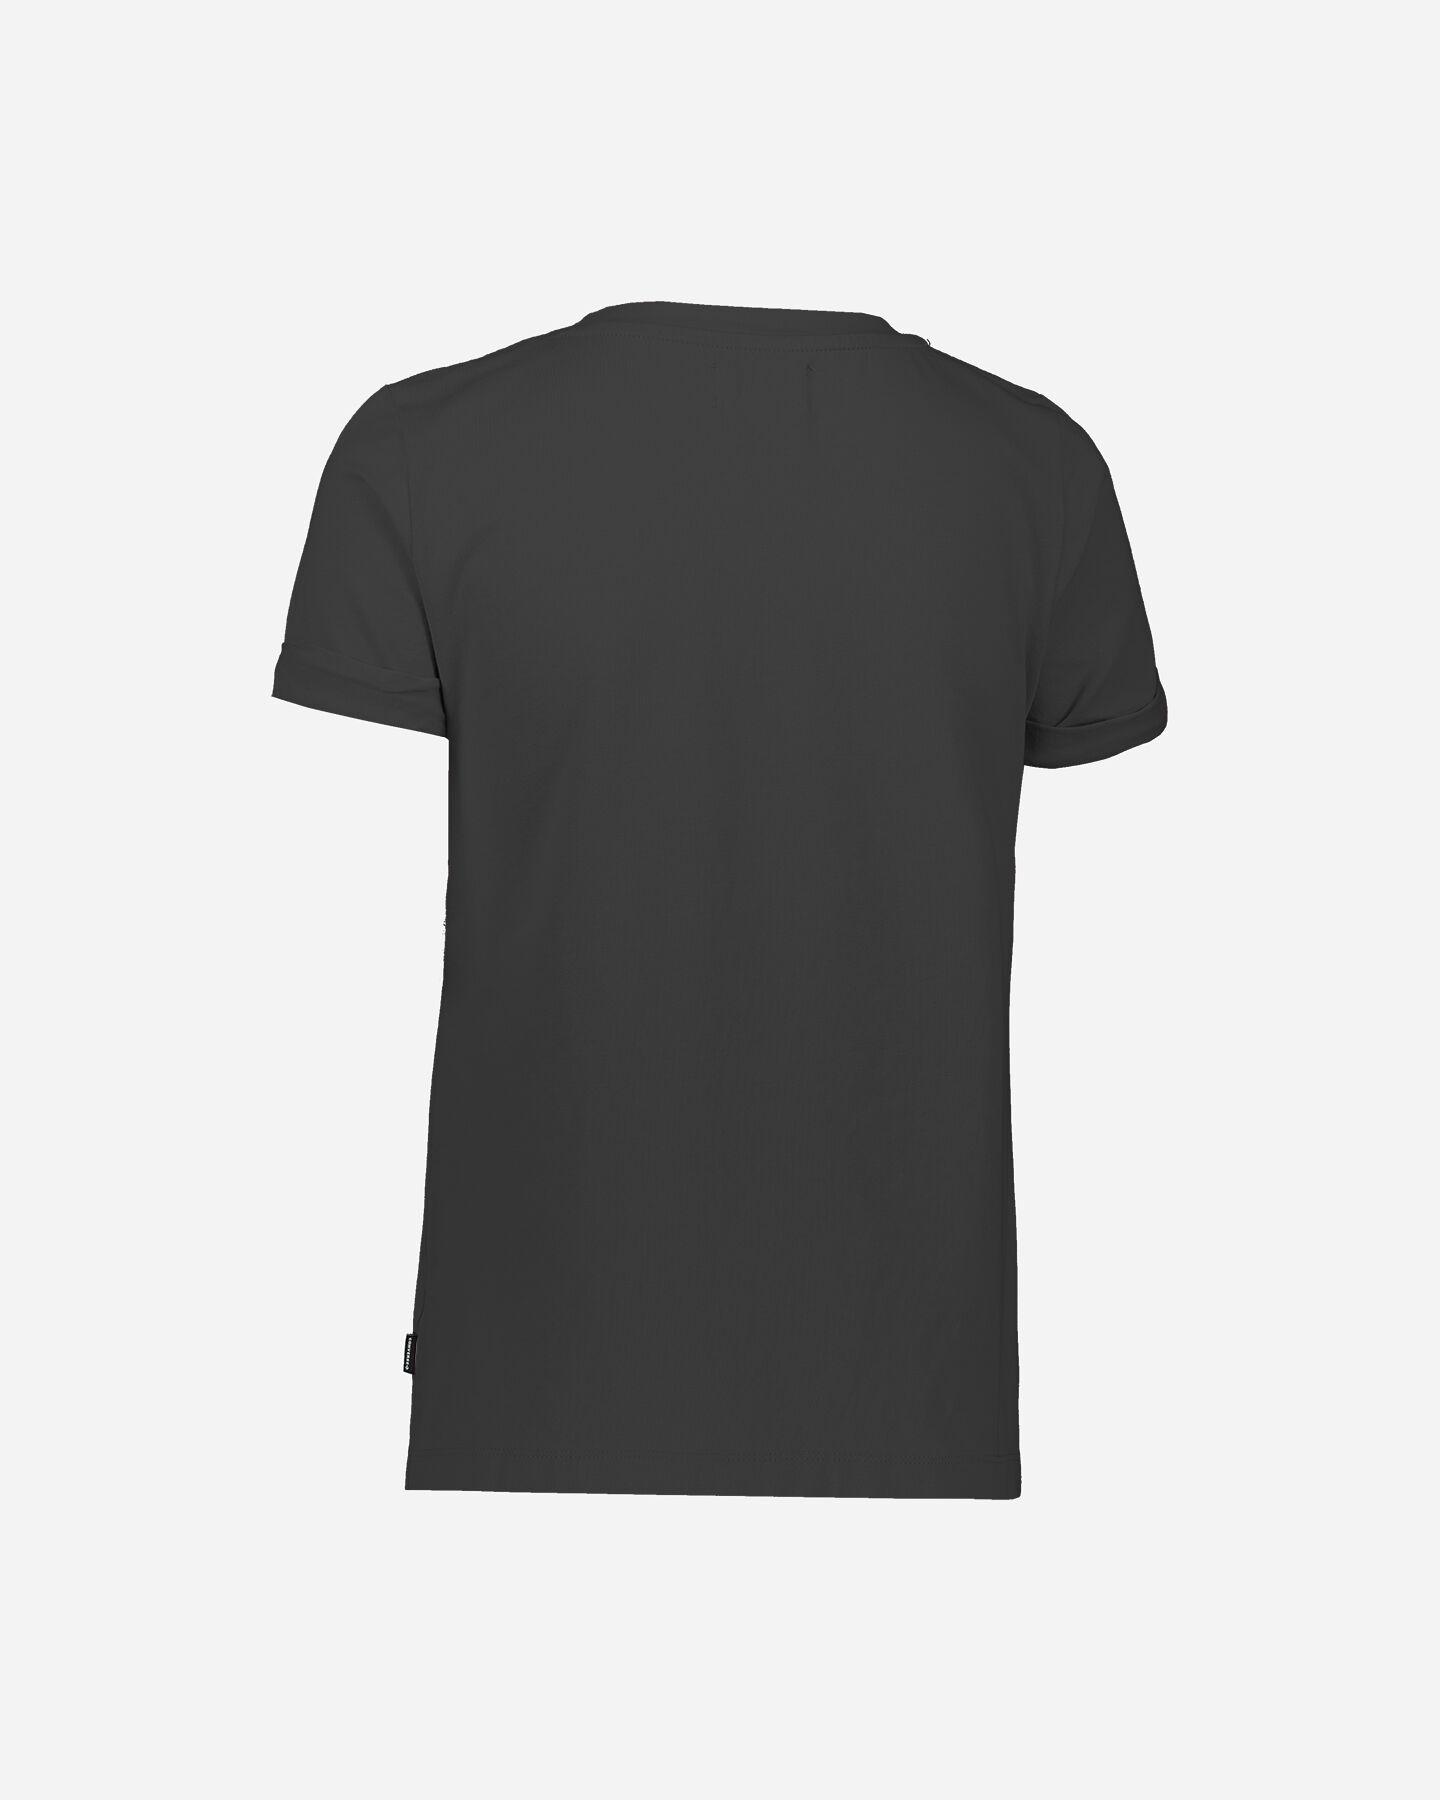 T-Shirt CONVERSE LOGO CLASSIC W S5181123 scatto 1